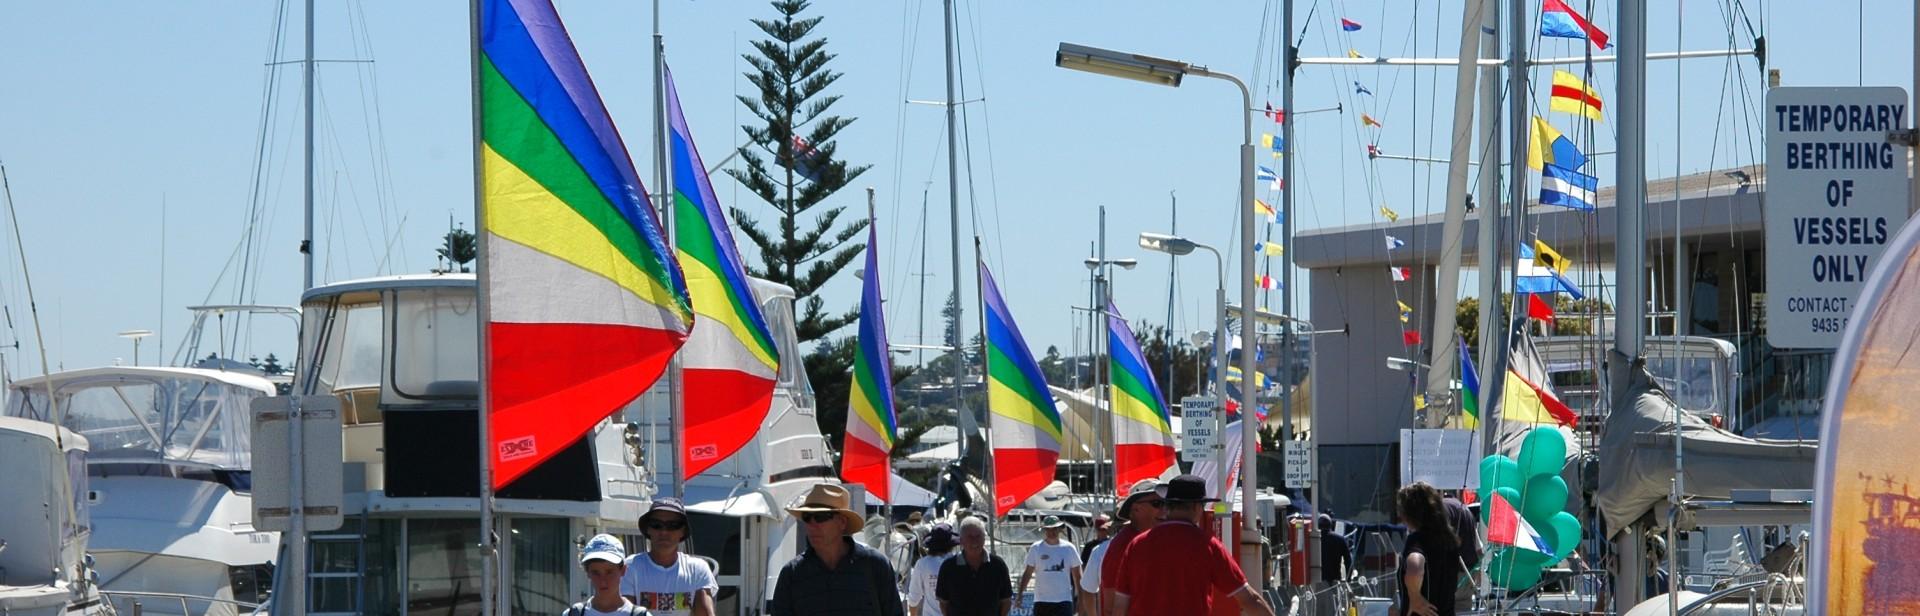 Fremantle Sailing Club Jetties